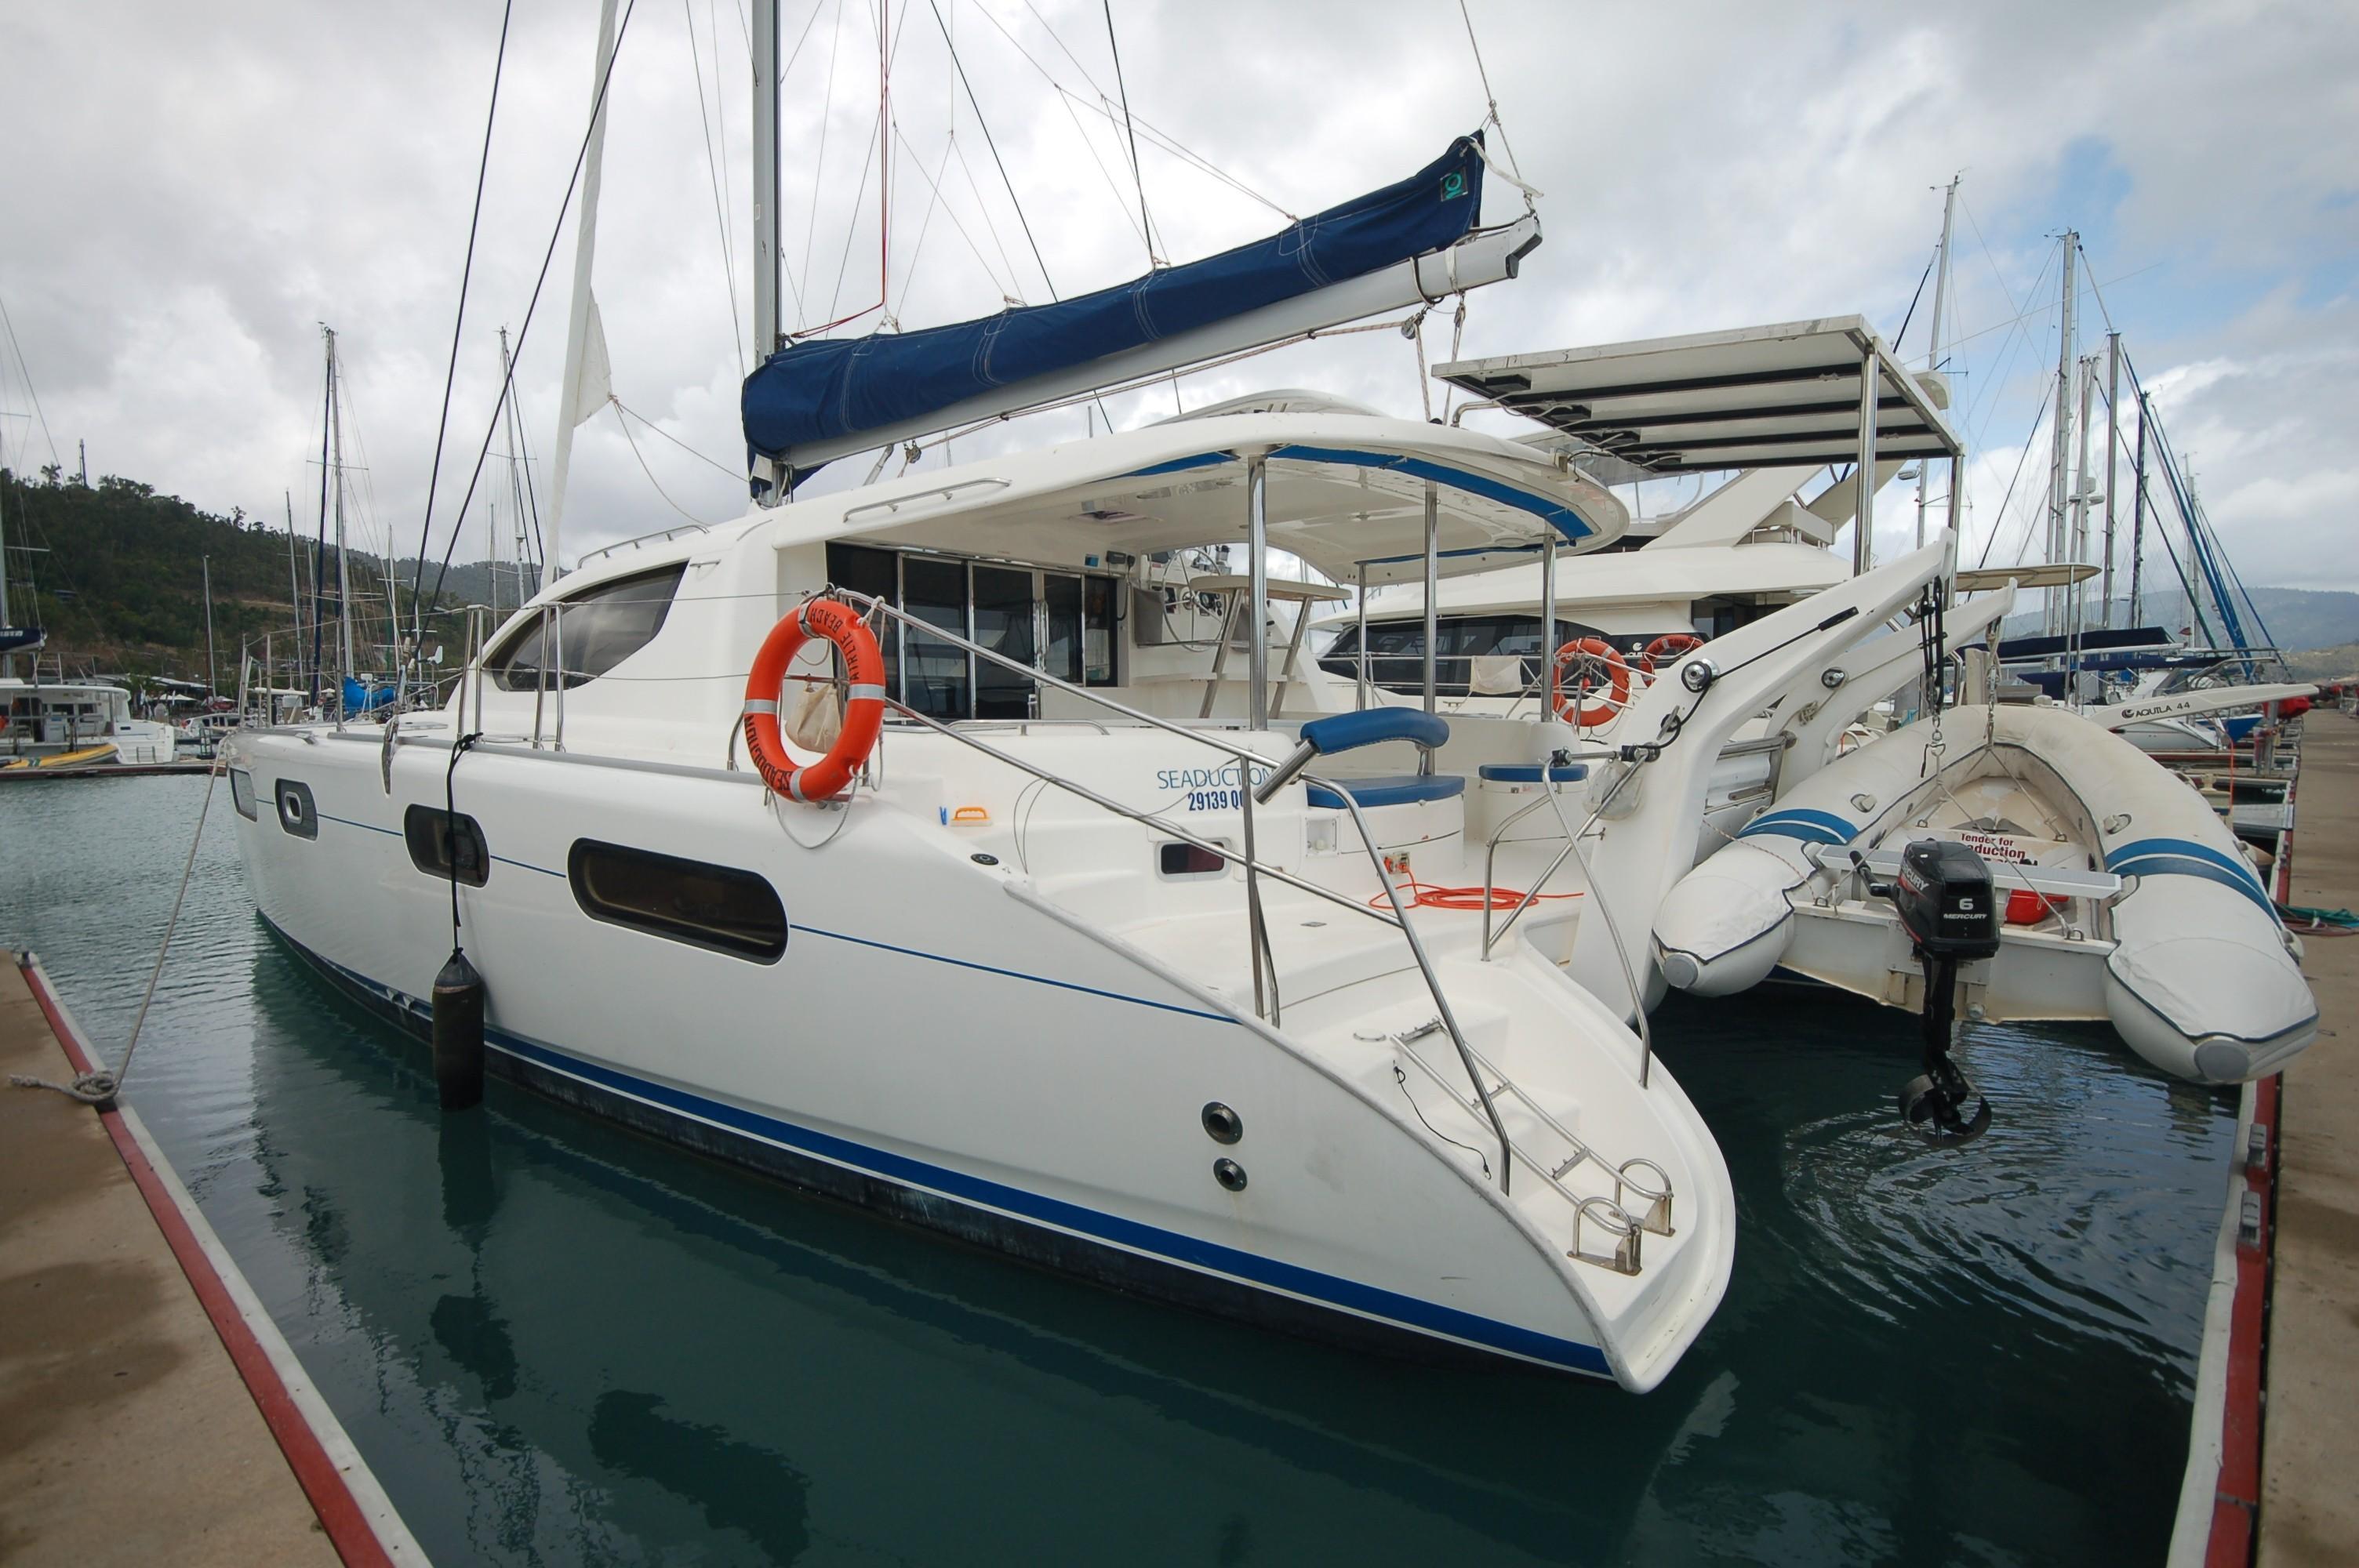 Leopard 46 Sailing Catamaran Seaduction for sale | Leopard ...